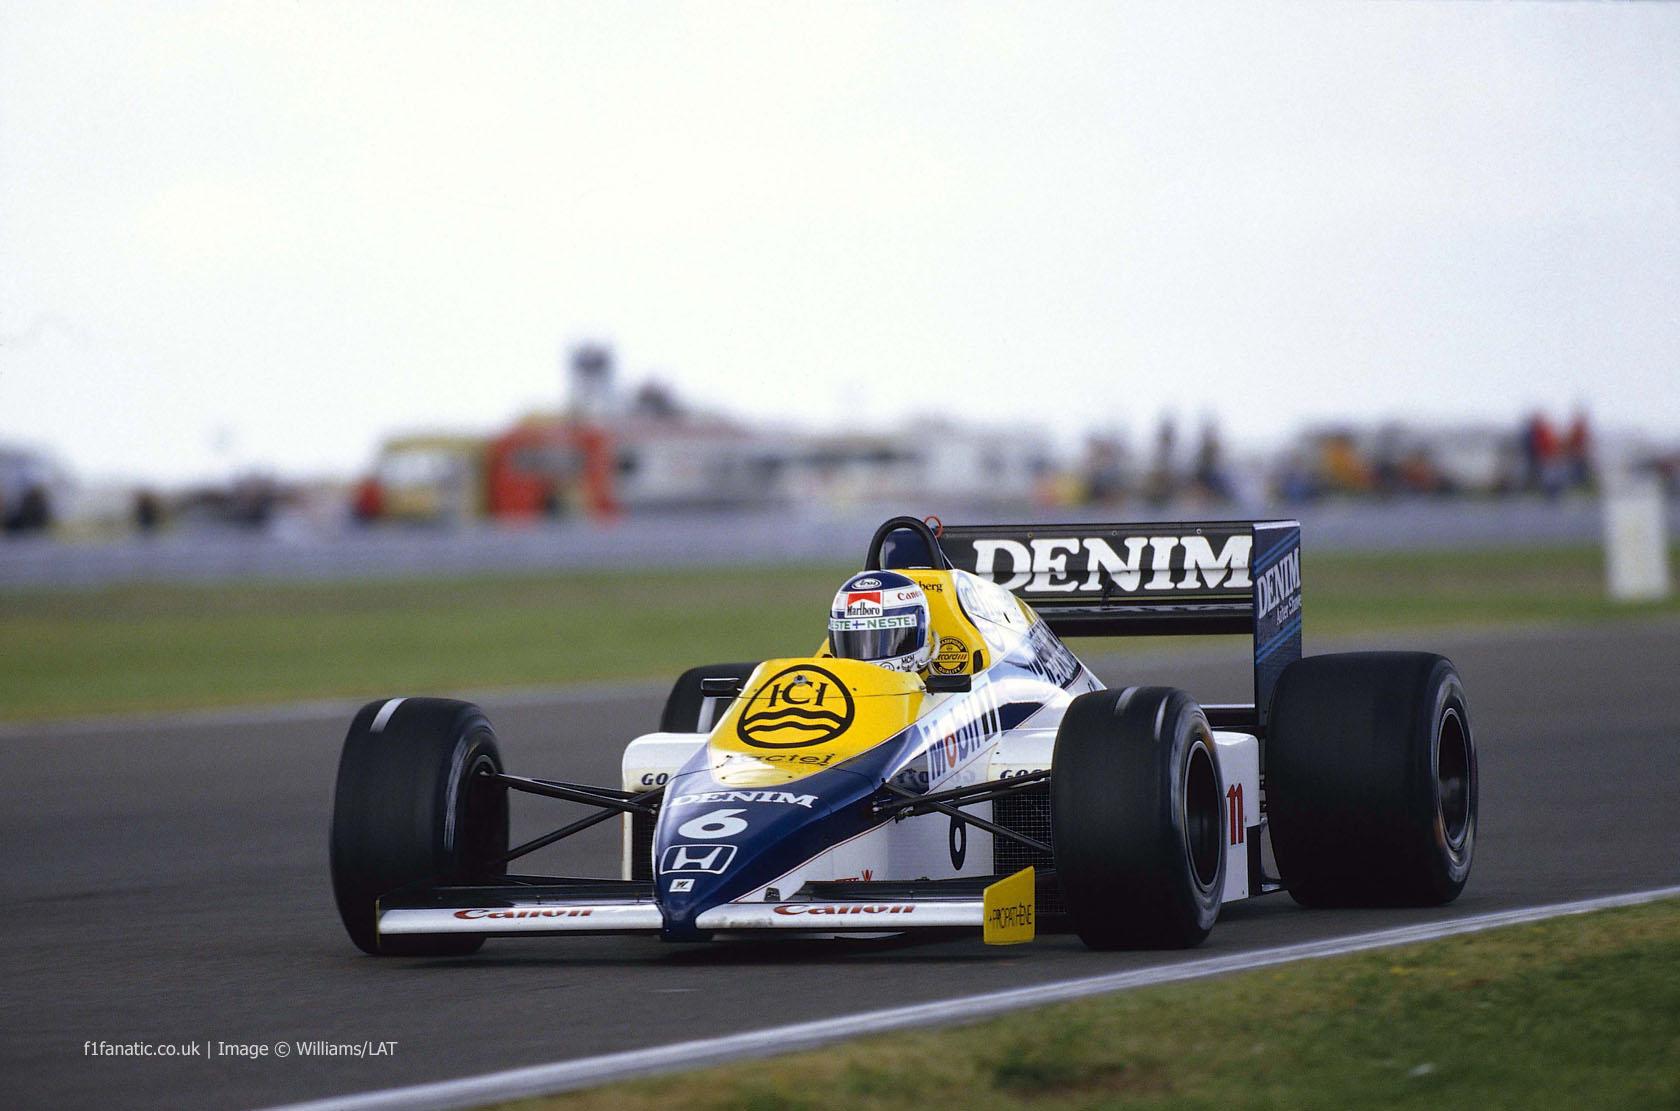 Keke Rosberg, Williams, Silverstone, 1985